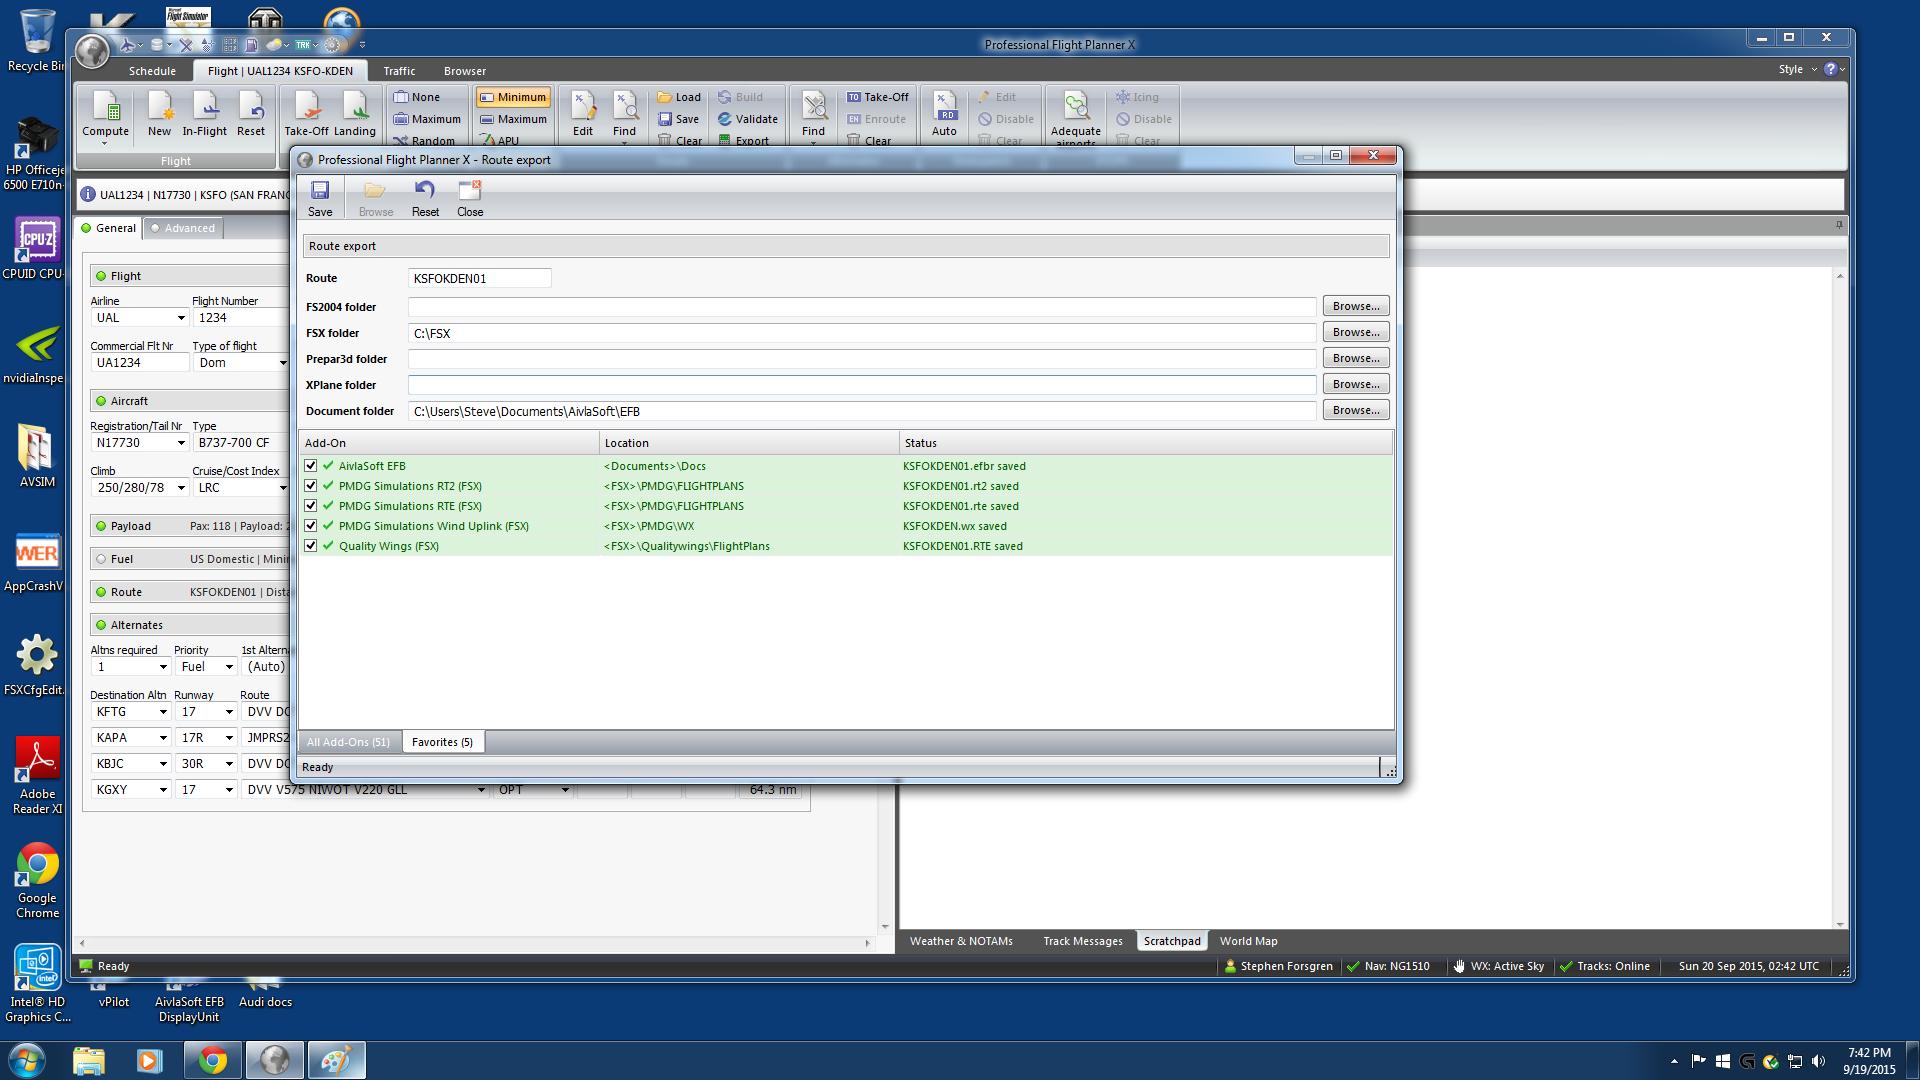 PFPX, Aeorsoft, Aivlasoft exporting problem - PFPX